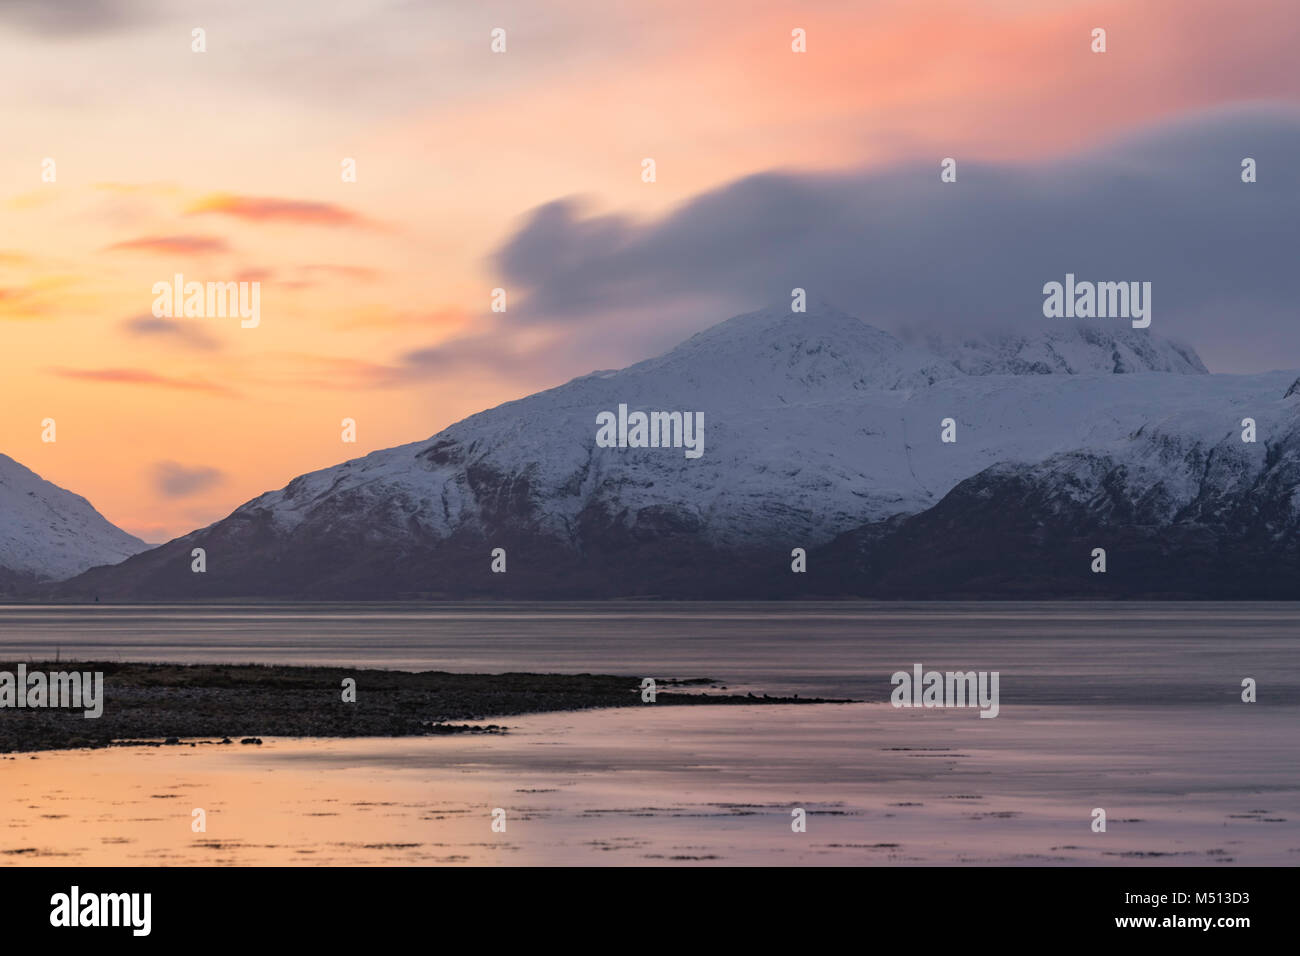 Loch Linnhe, Glencoe, Highlands, Scotland, United Kingdom - Stock Image